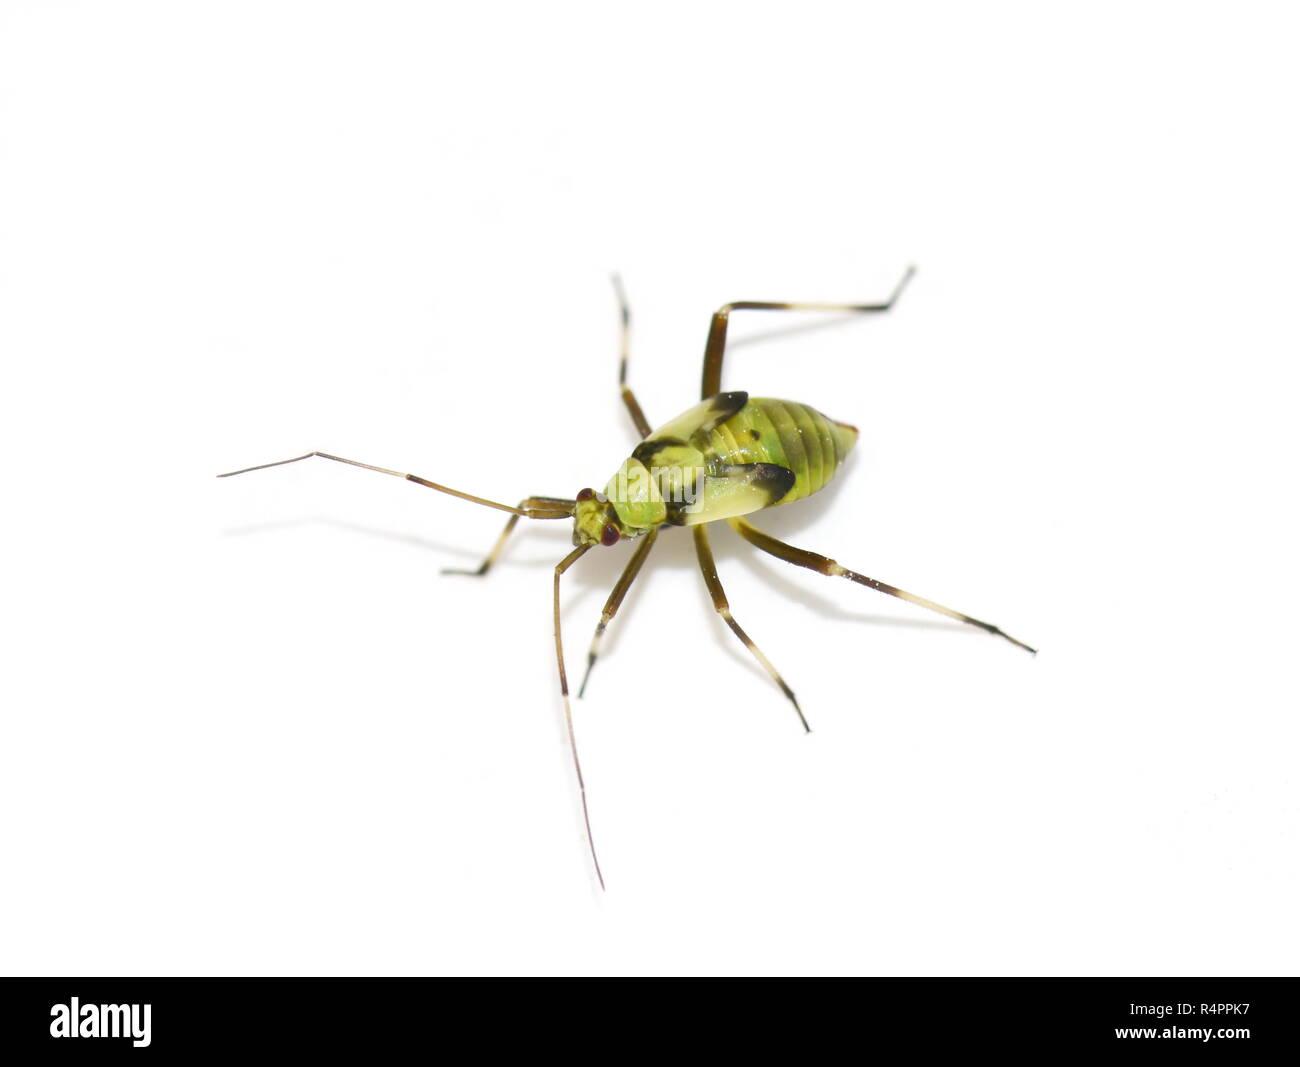 Common green capsid nymph Lygocoris pabulinus isolated on white background - Stock Image